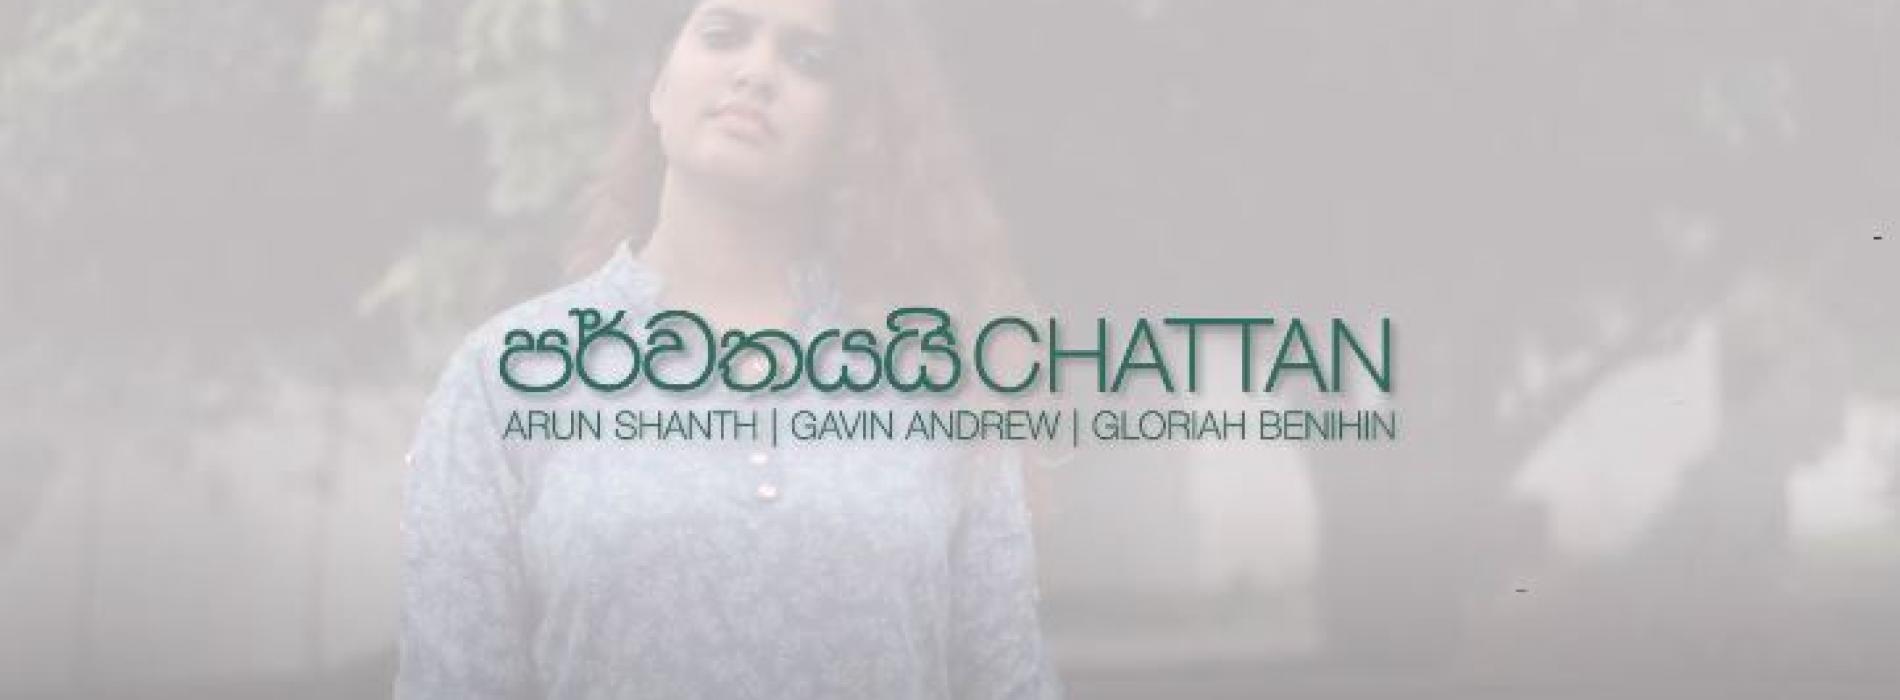 New Music : Chattan   Parwathayai   Sinhala Version – Arun Shanth   Gavin Andrew   Gloriah Benihin